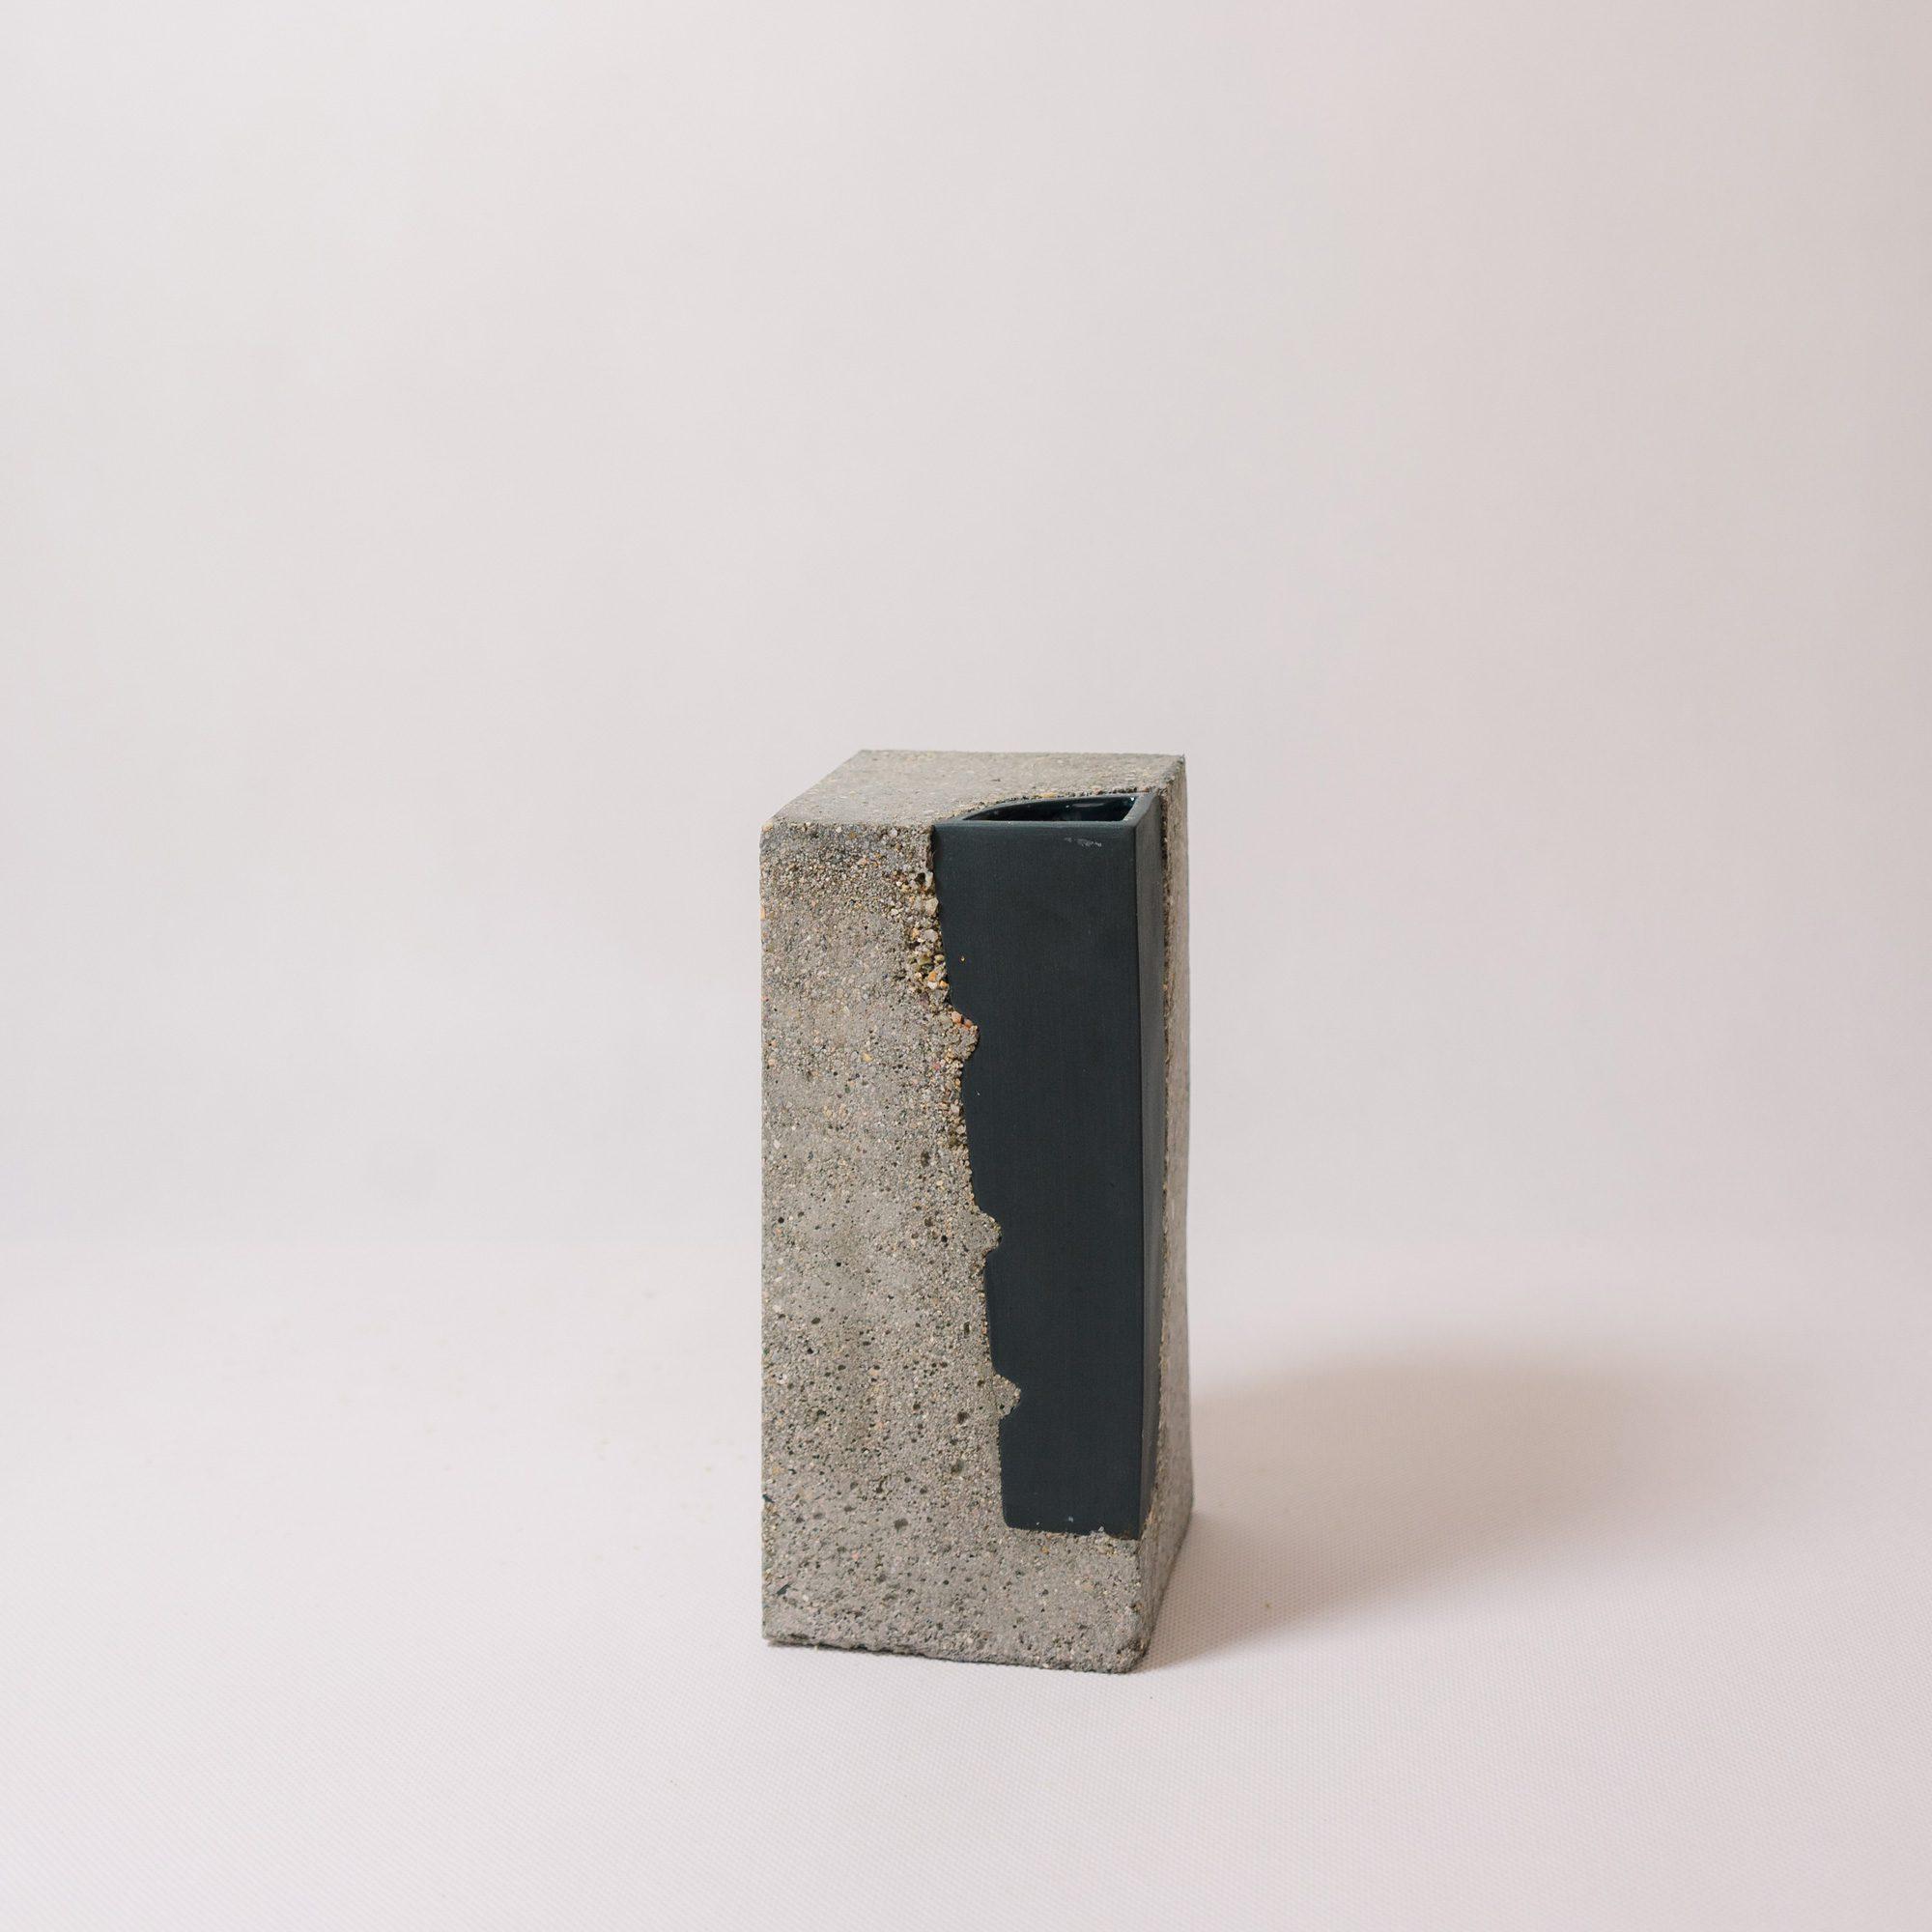 Black coloured porcelain vase encapsulated in concrete by Vobouch designers 02